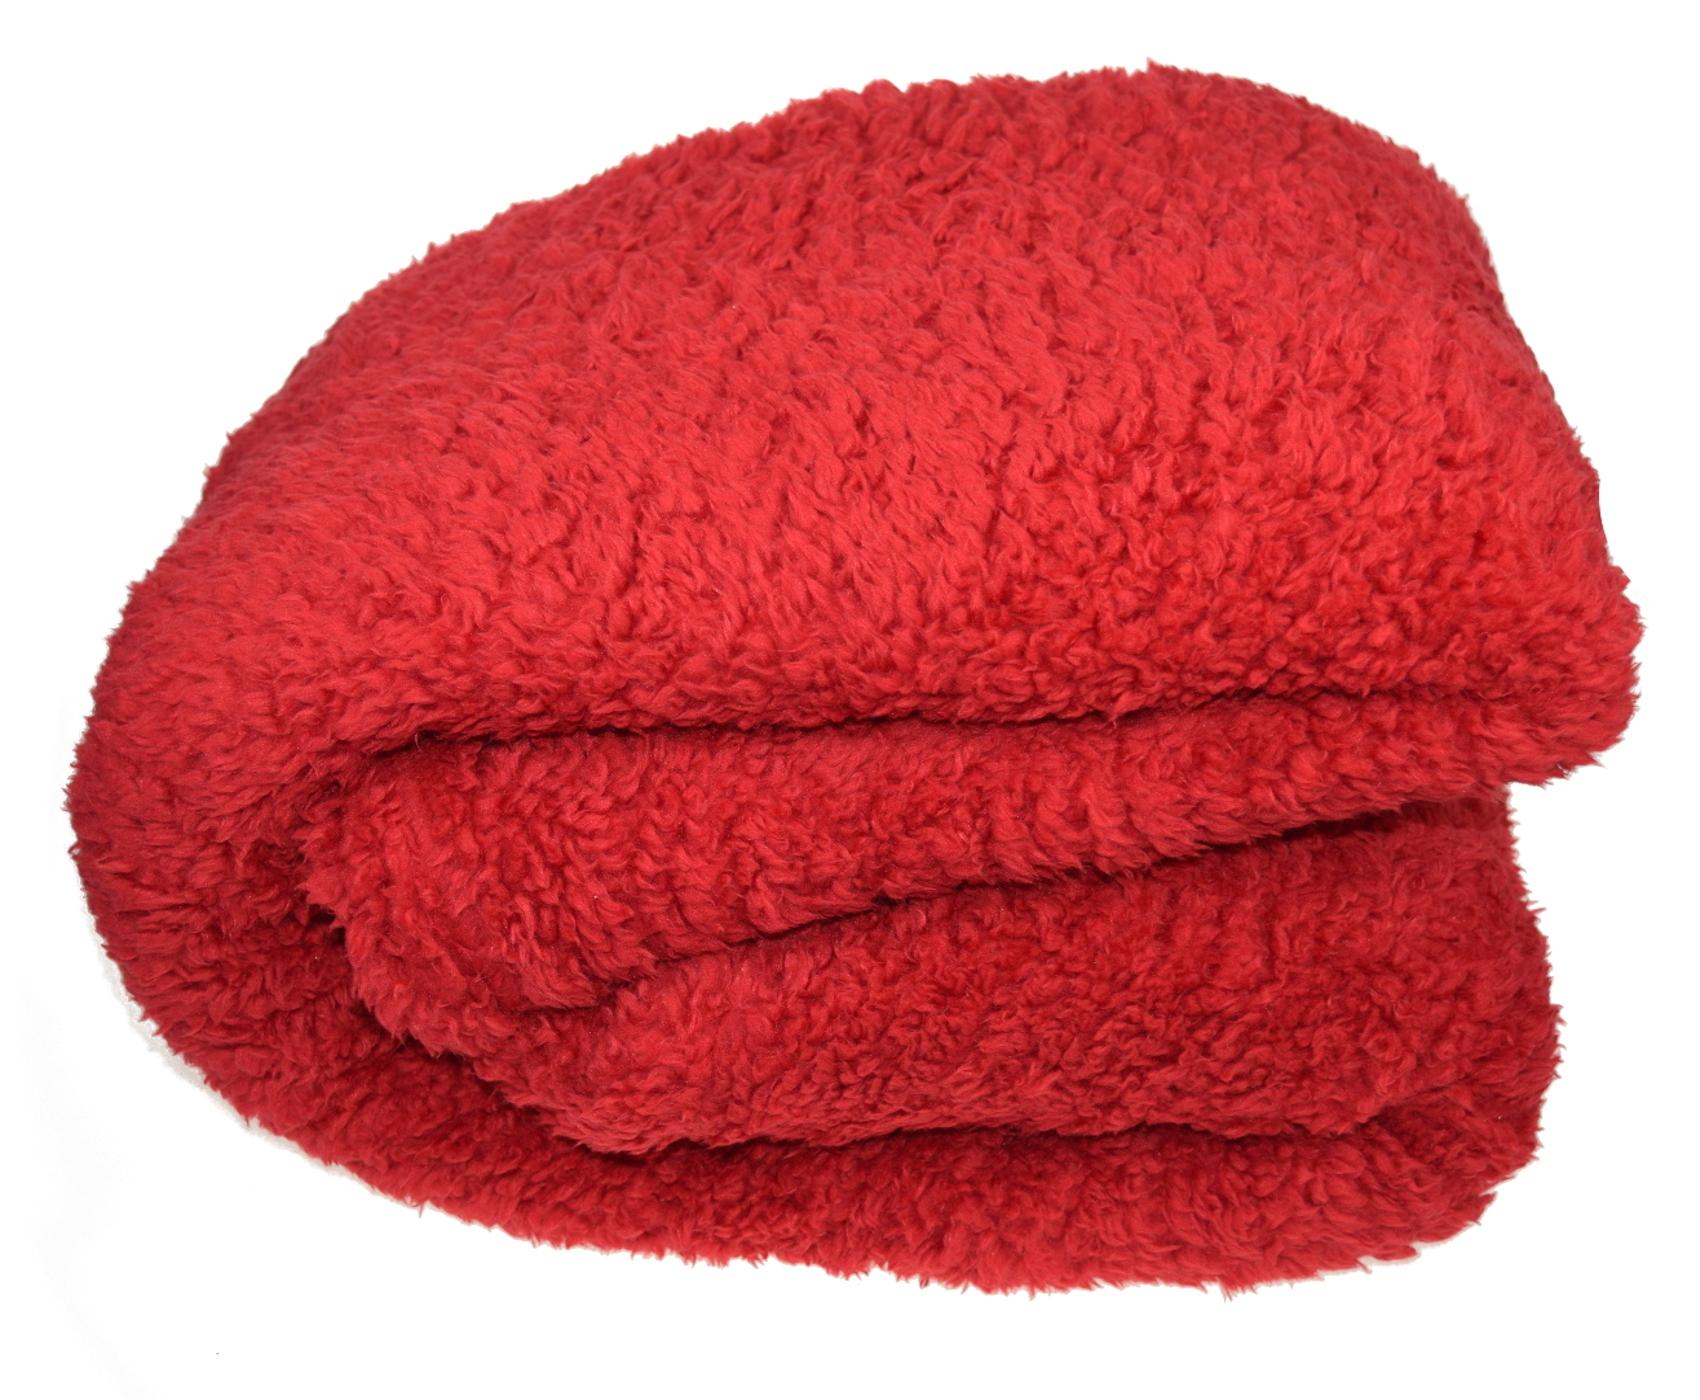 Super Soft Teddy Fleece Blanket Cosy Sofa Bed Luxury